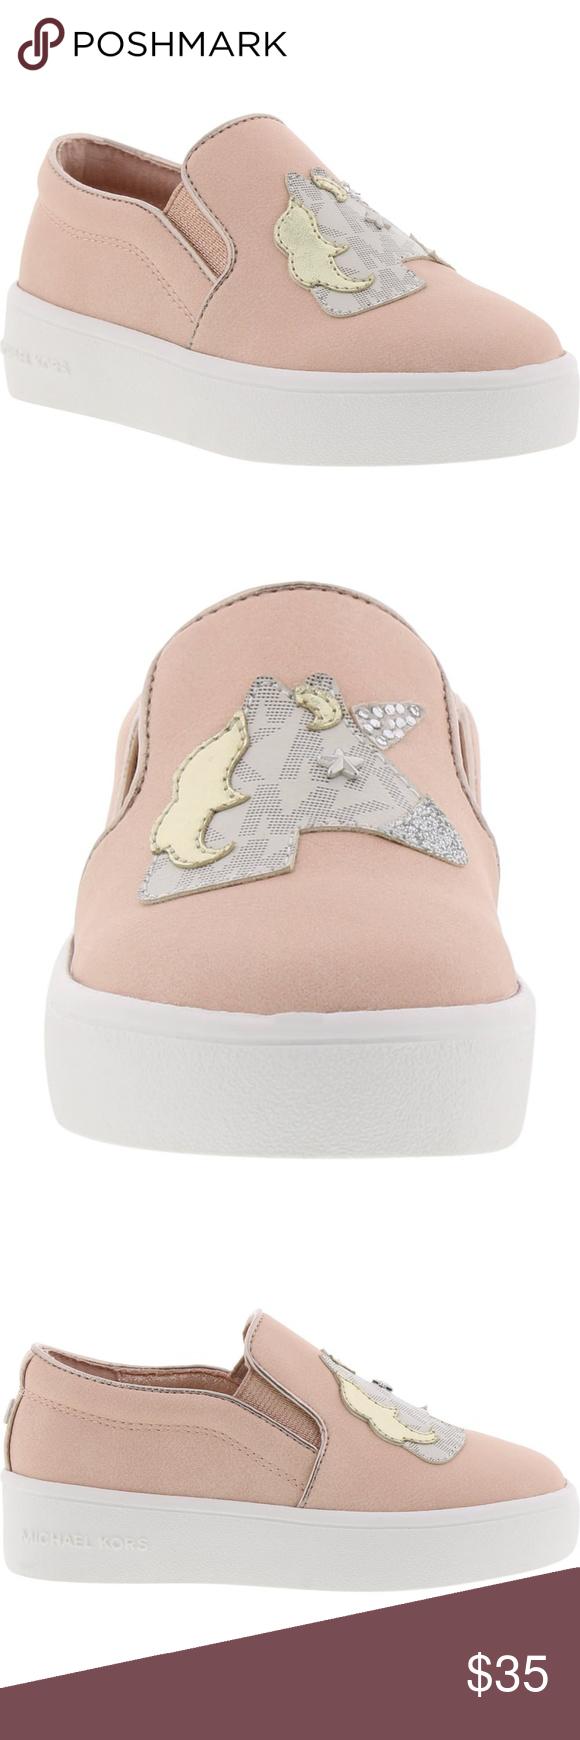 Michael Kors Kids Shoes - Little Kids